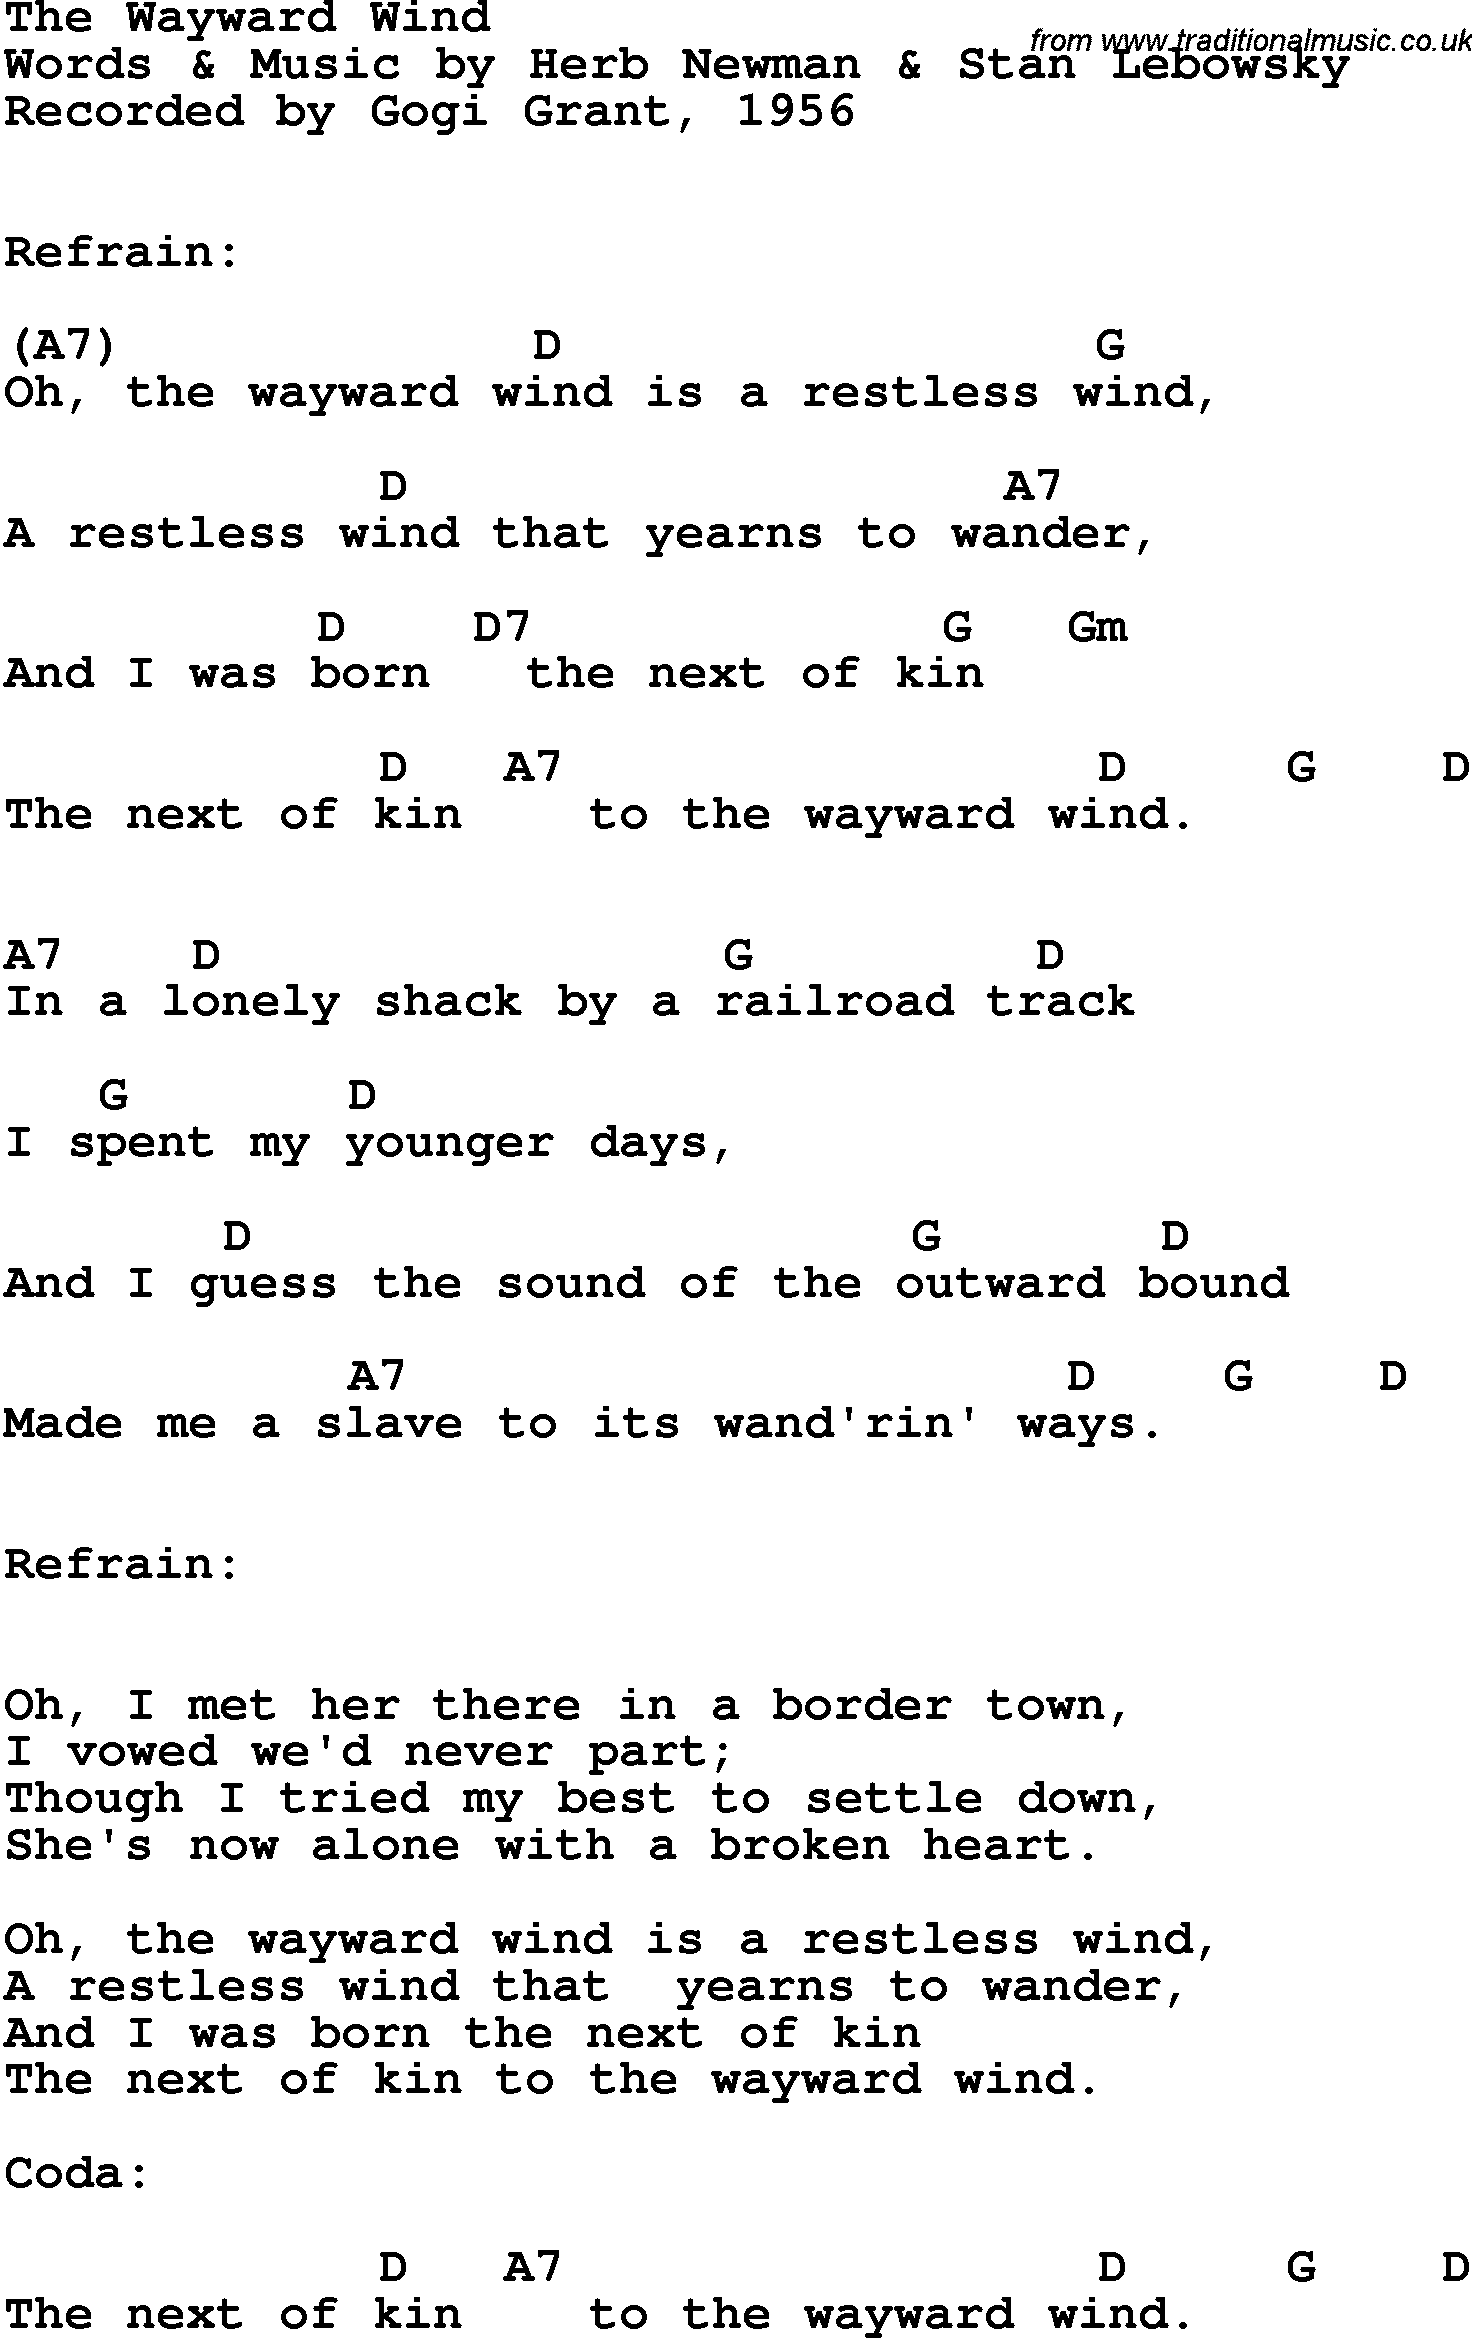 Song lyrics with guitar chords for wayward wind the gogi grant song lyrics with guitar chords for wayward wind the gogi grant 1956 hexwebz Image collections